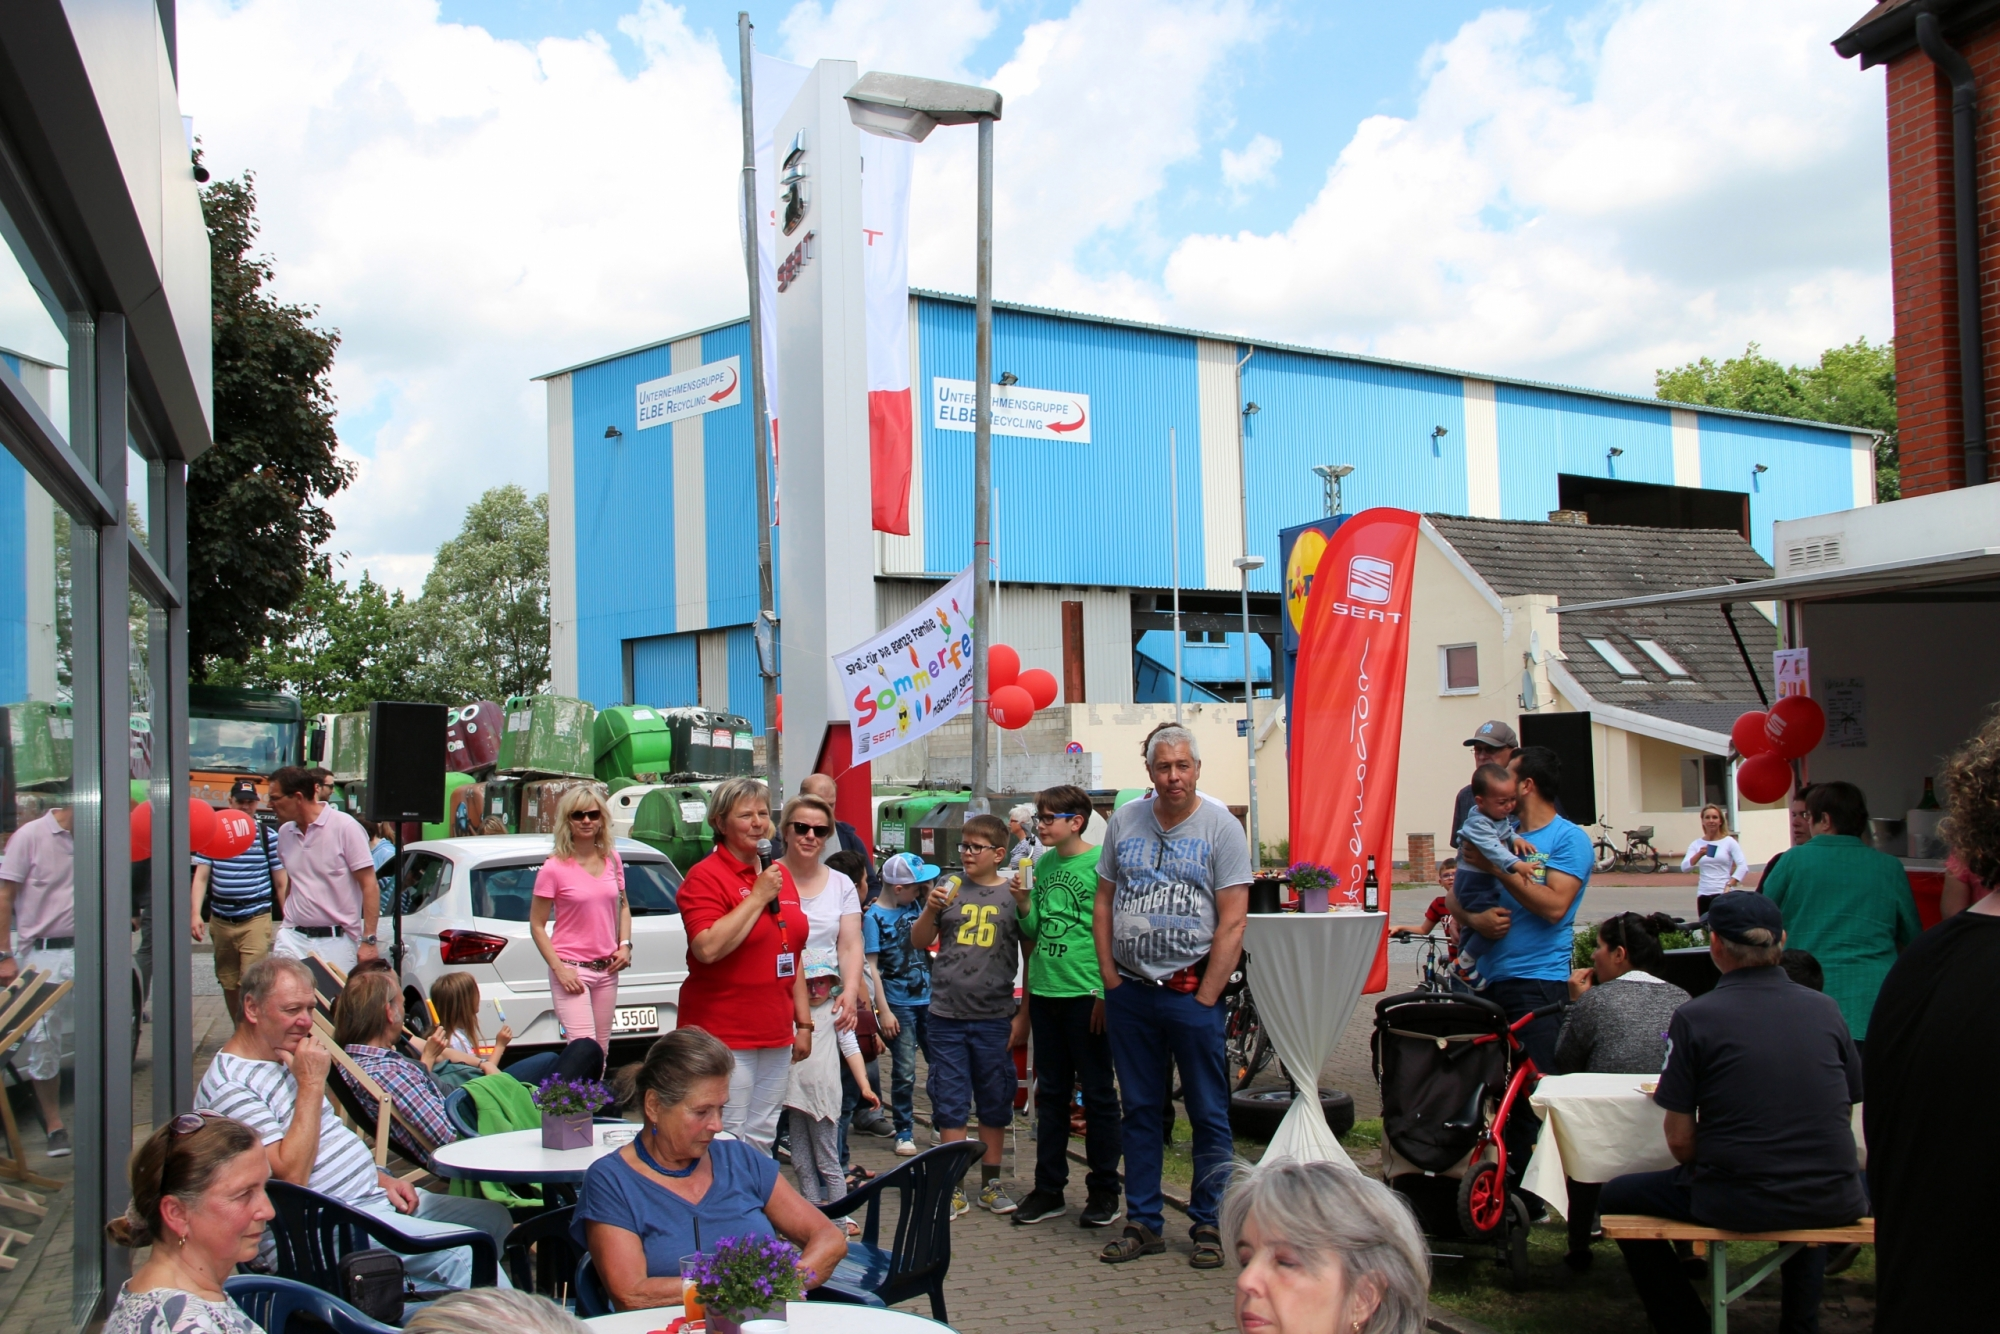 2017 07 05 Seat Wedel Hamburg Rückblick Sommerfest 2017 Impressionen 03 1 scaled